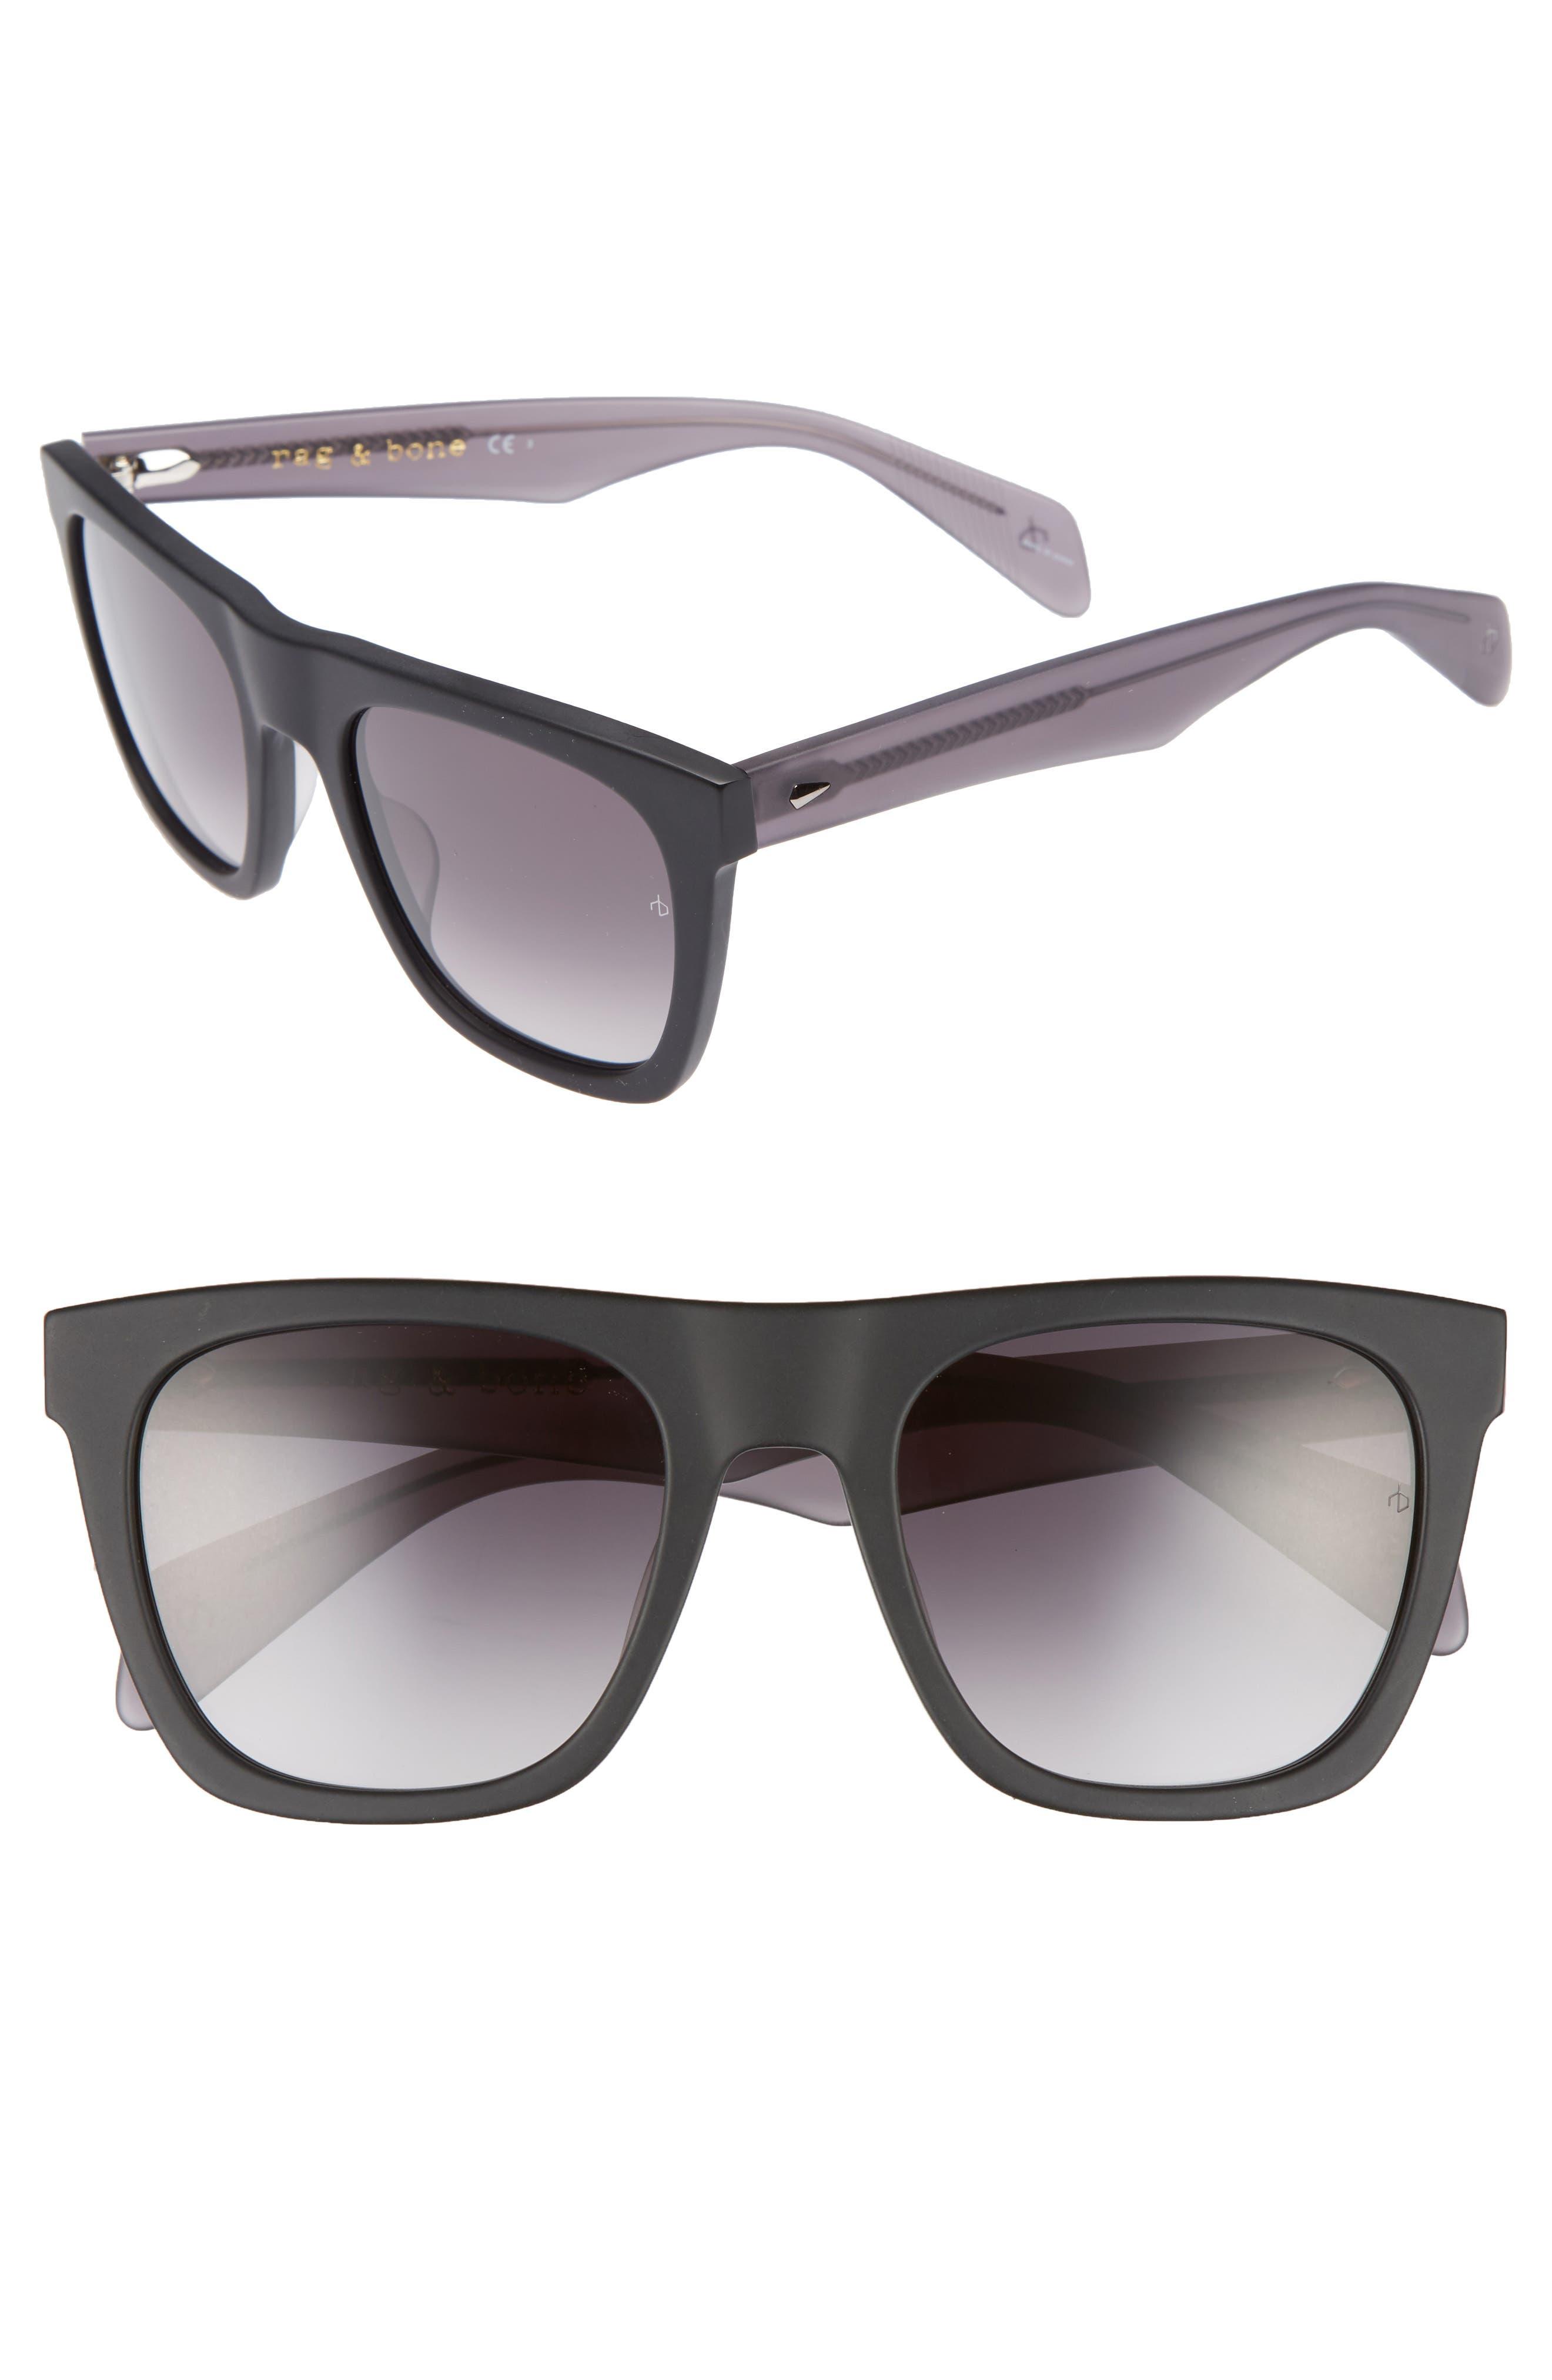 54mm Gradient Sunglasses,                         Main,                         color, BLUE/ DARK GREY